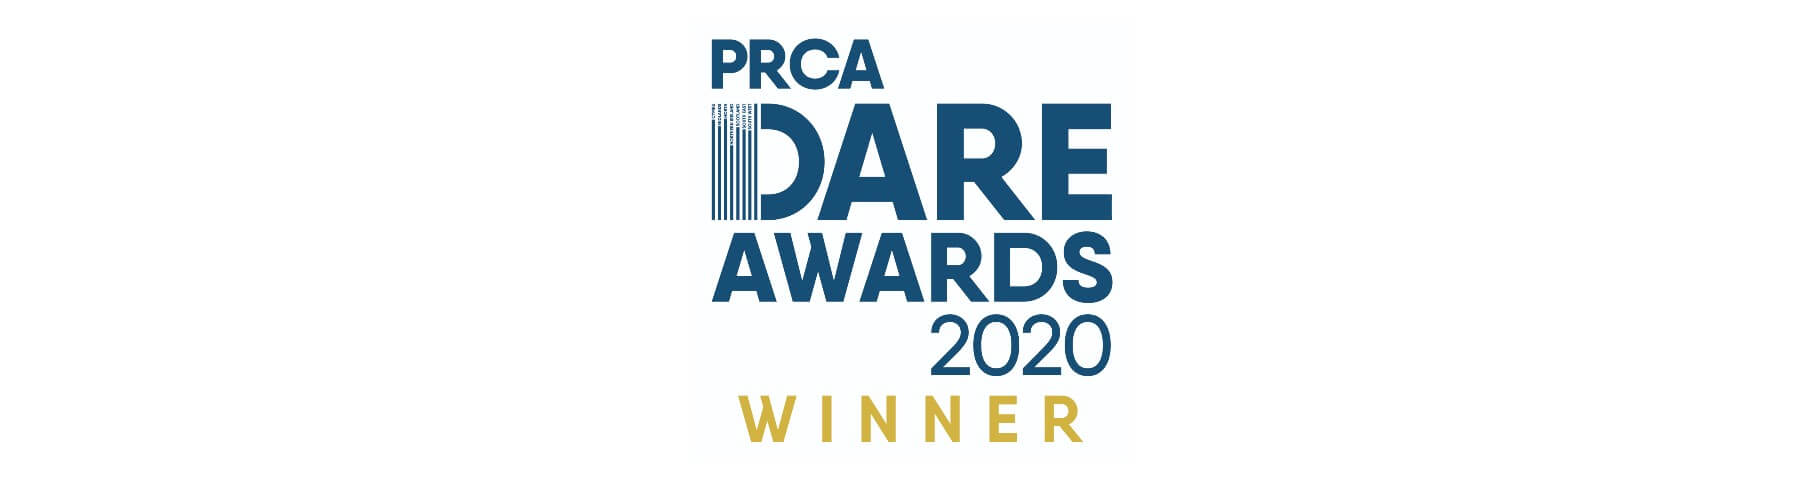 Cratus Account Manager, Charlotte Platten, wins top PR award